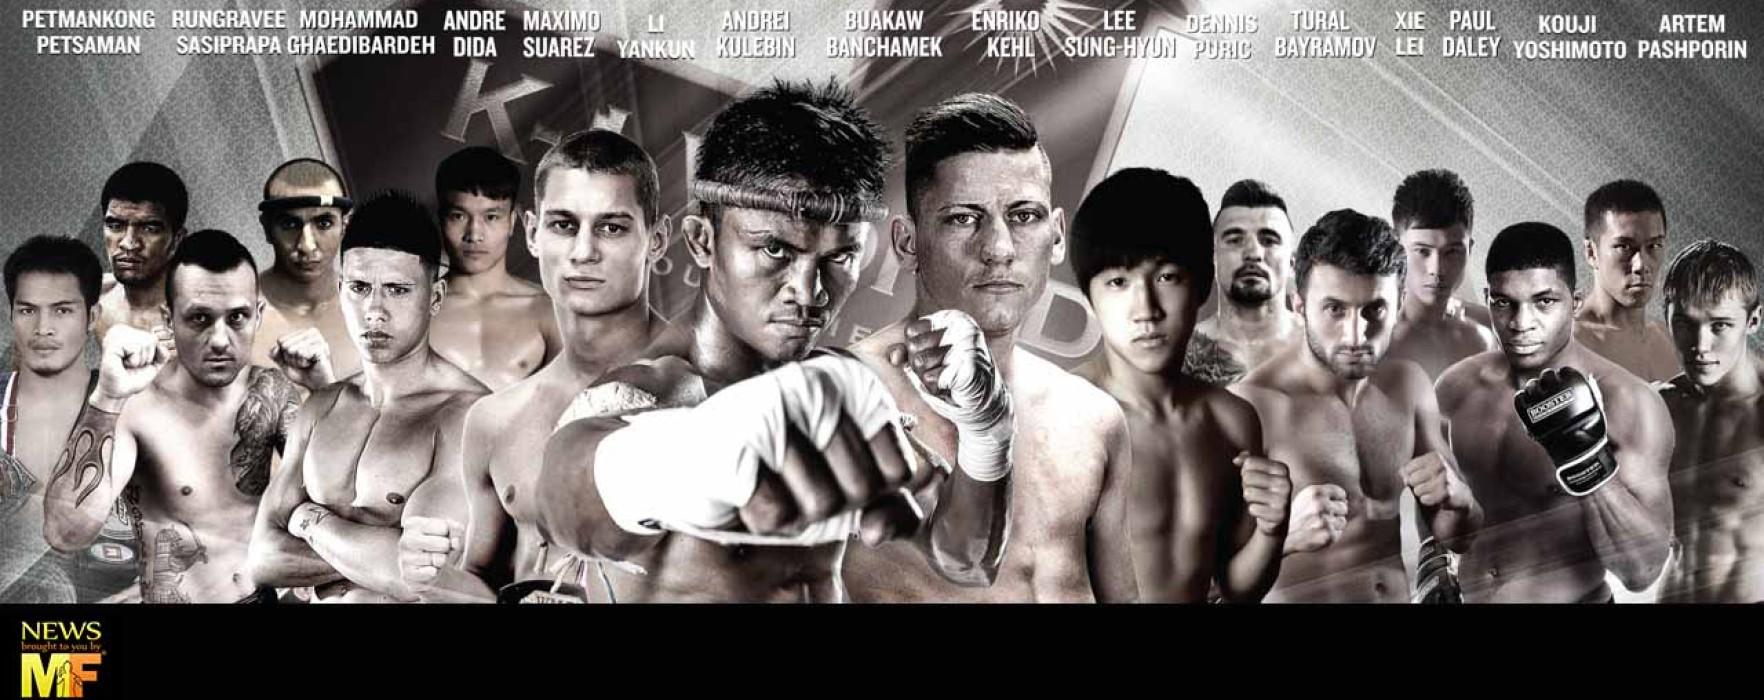 Card: K-1 World Max Final Pattaya – Buakaw, Kehl, Rungravee, Kulebin ect – 11th October 2014